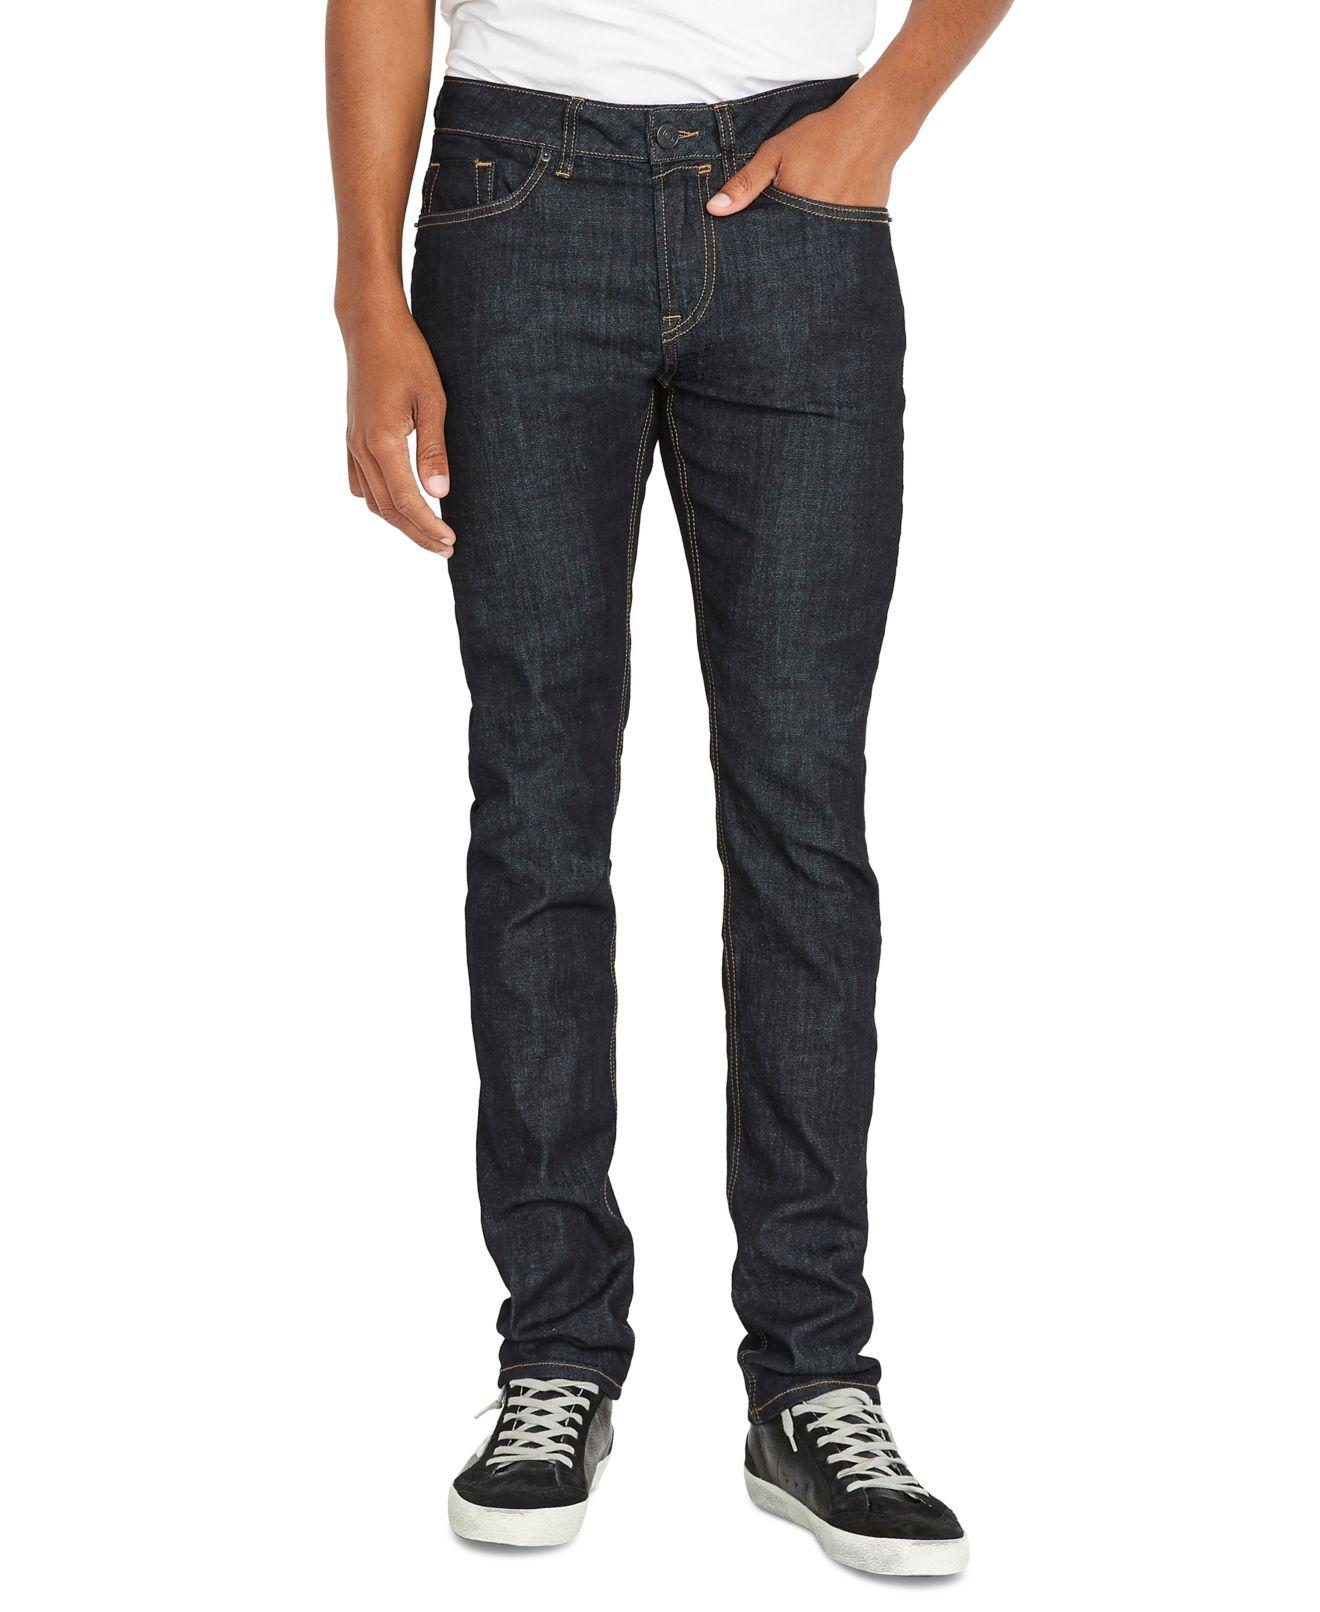 Buffalo David Bitton Mens Jeans Blue Size 31X30 Slim Fit Stretch